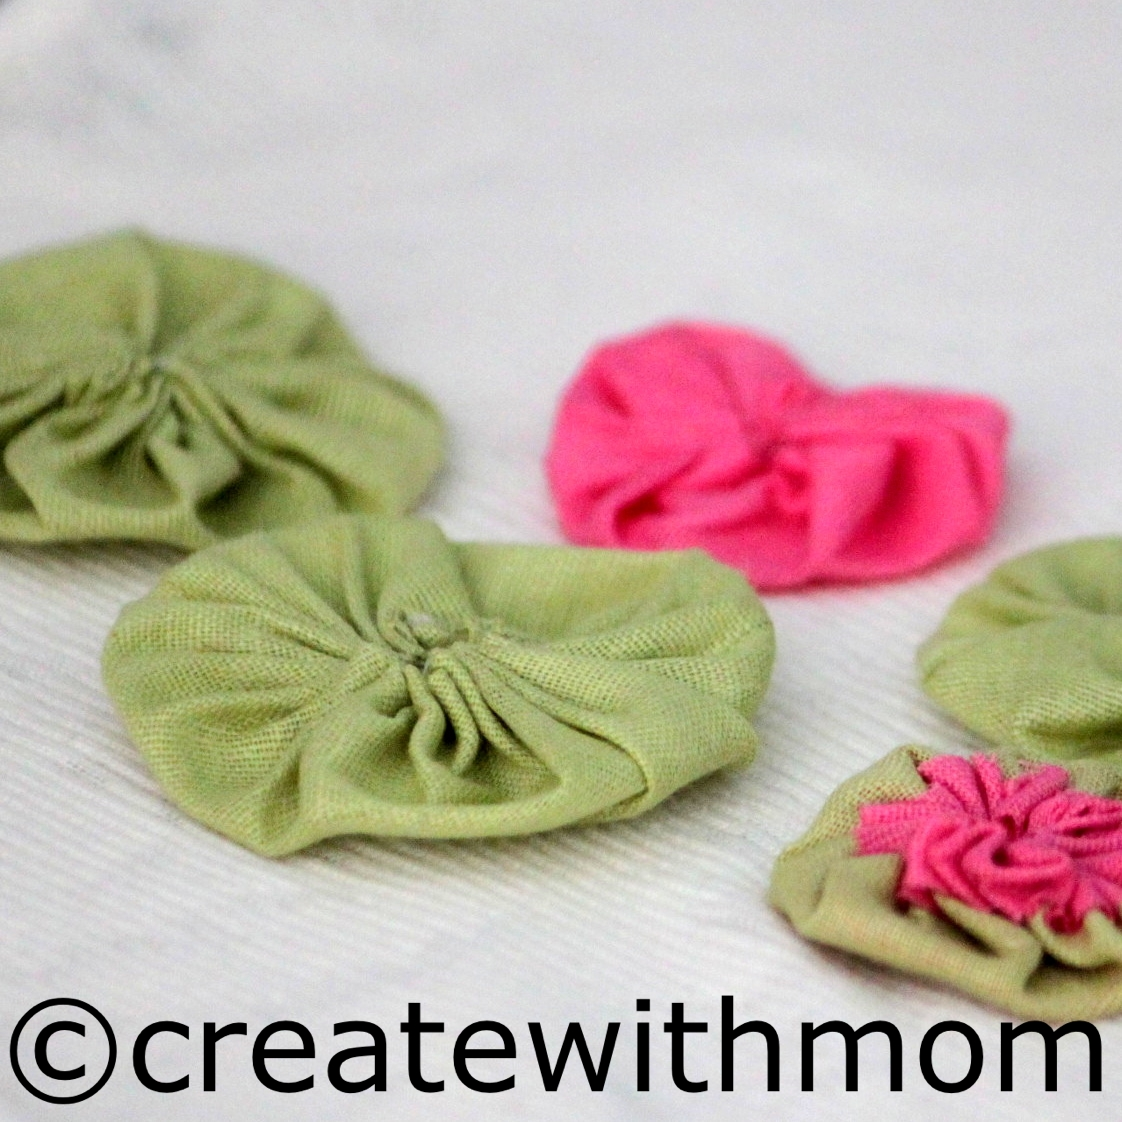 how to make fabric yoyos